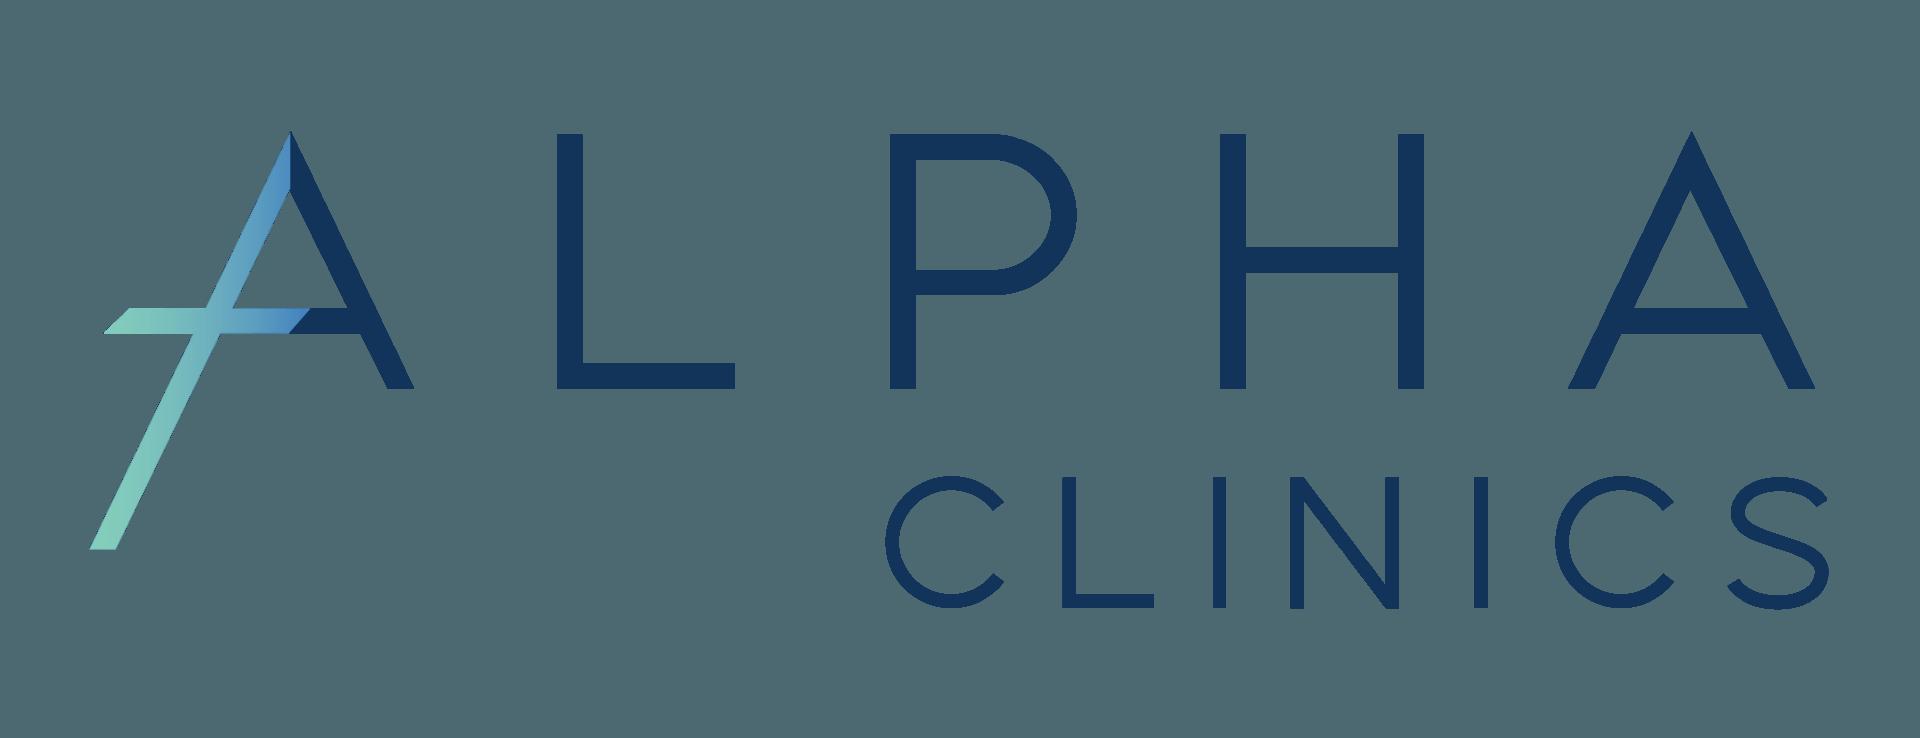 Free Pregnancy & Family Services | Alpha Pregnancy Clinics